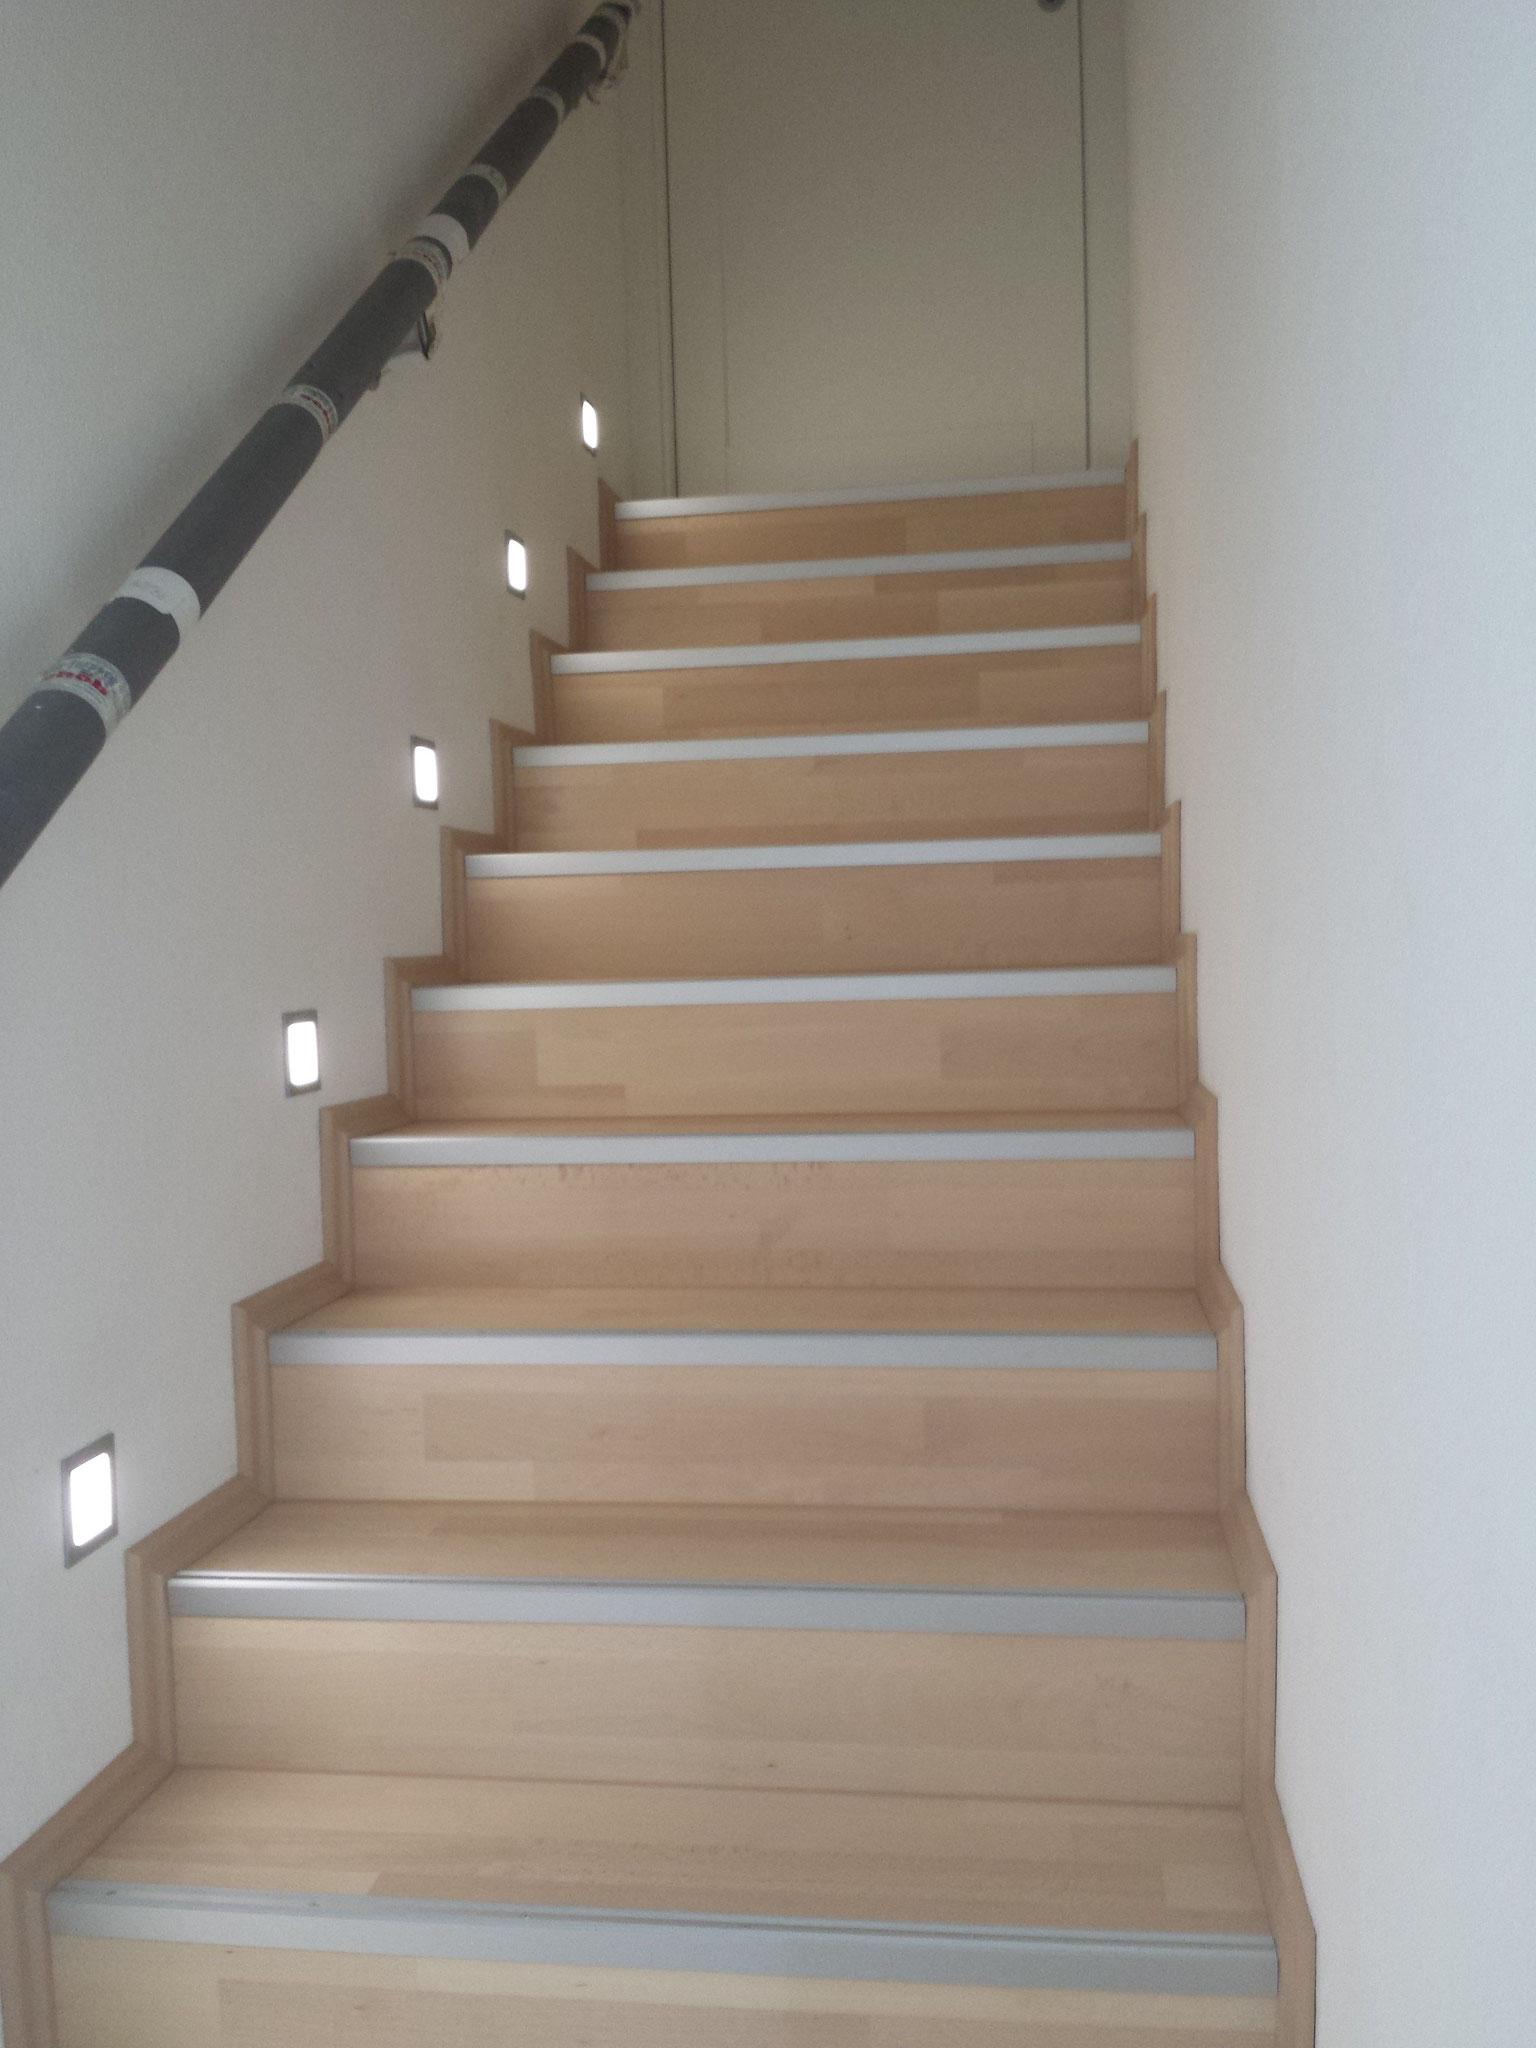 Treppe mit Parkett belegt